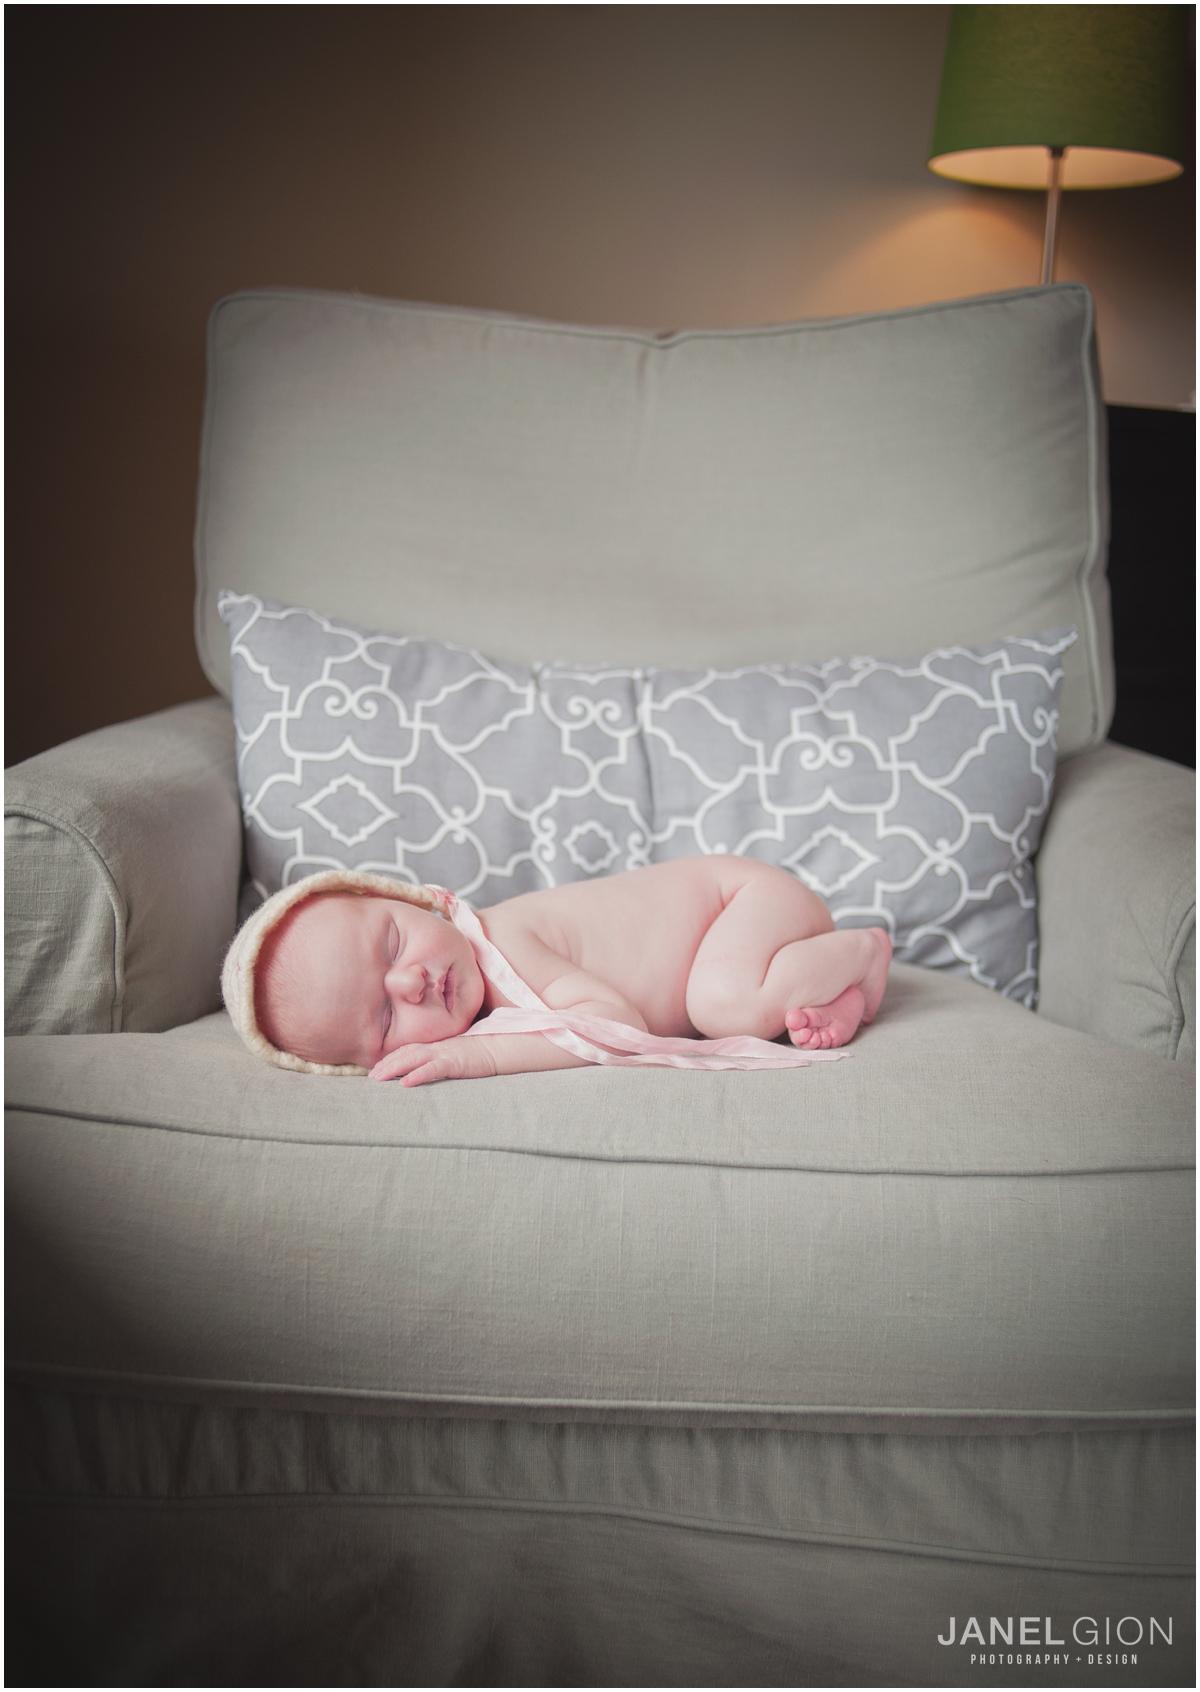 Janel-Gion-Sandpoint-Idaho-Newborn-Photographer_0001.png